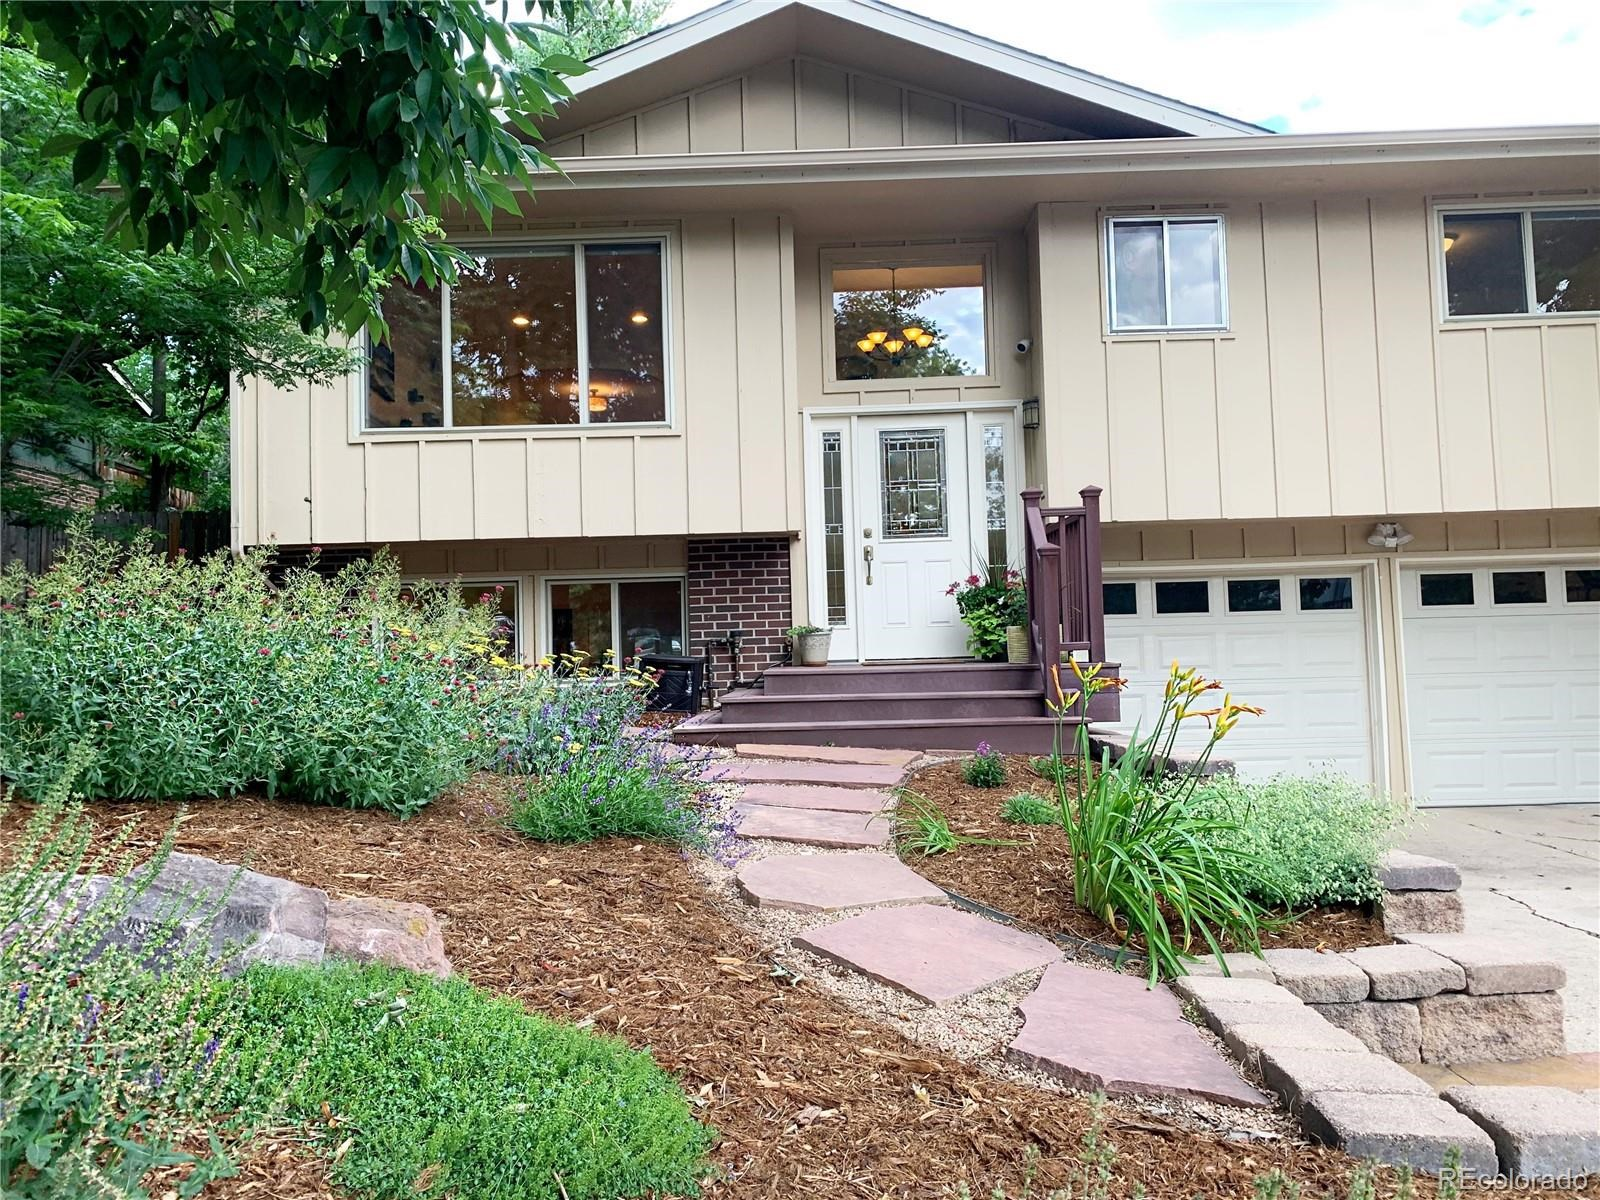 MLS# 7212856 - 2 - 3415 Heidelberg Drive, Boulder, CO 80305